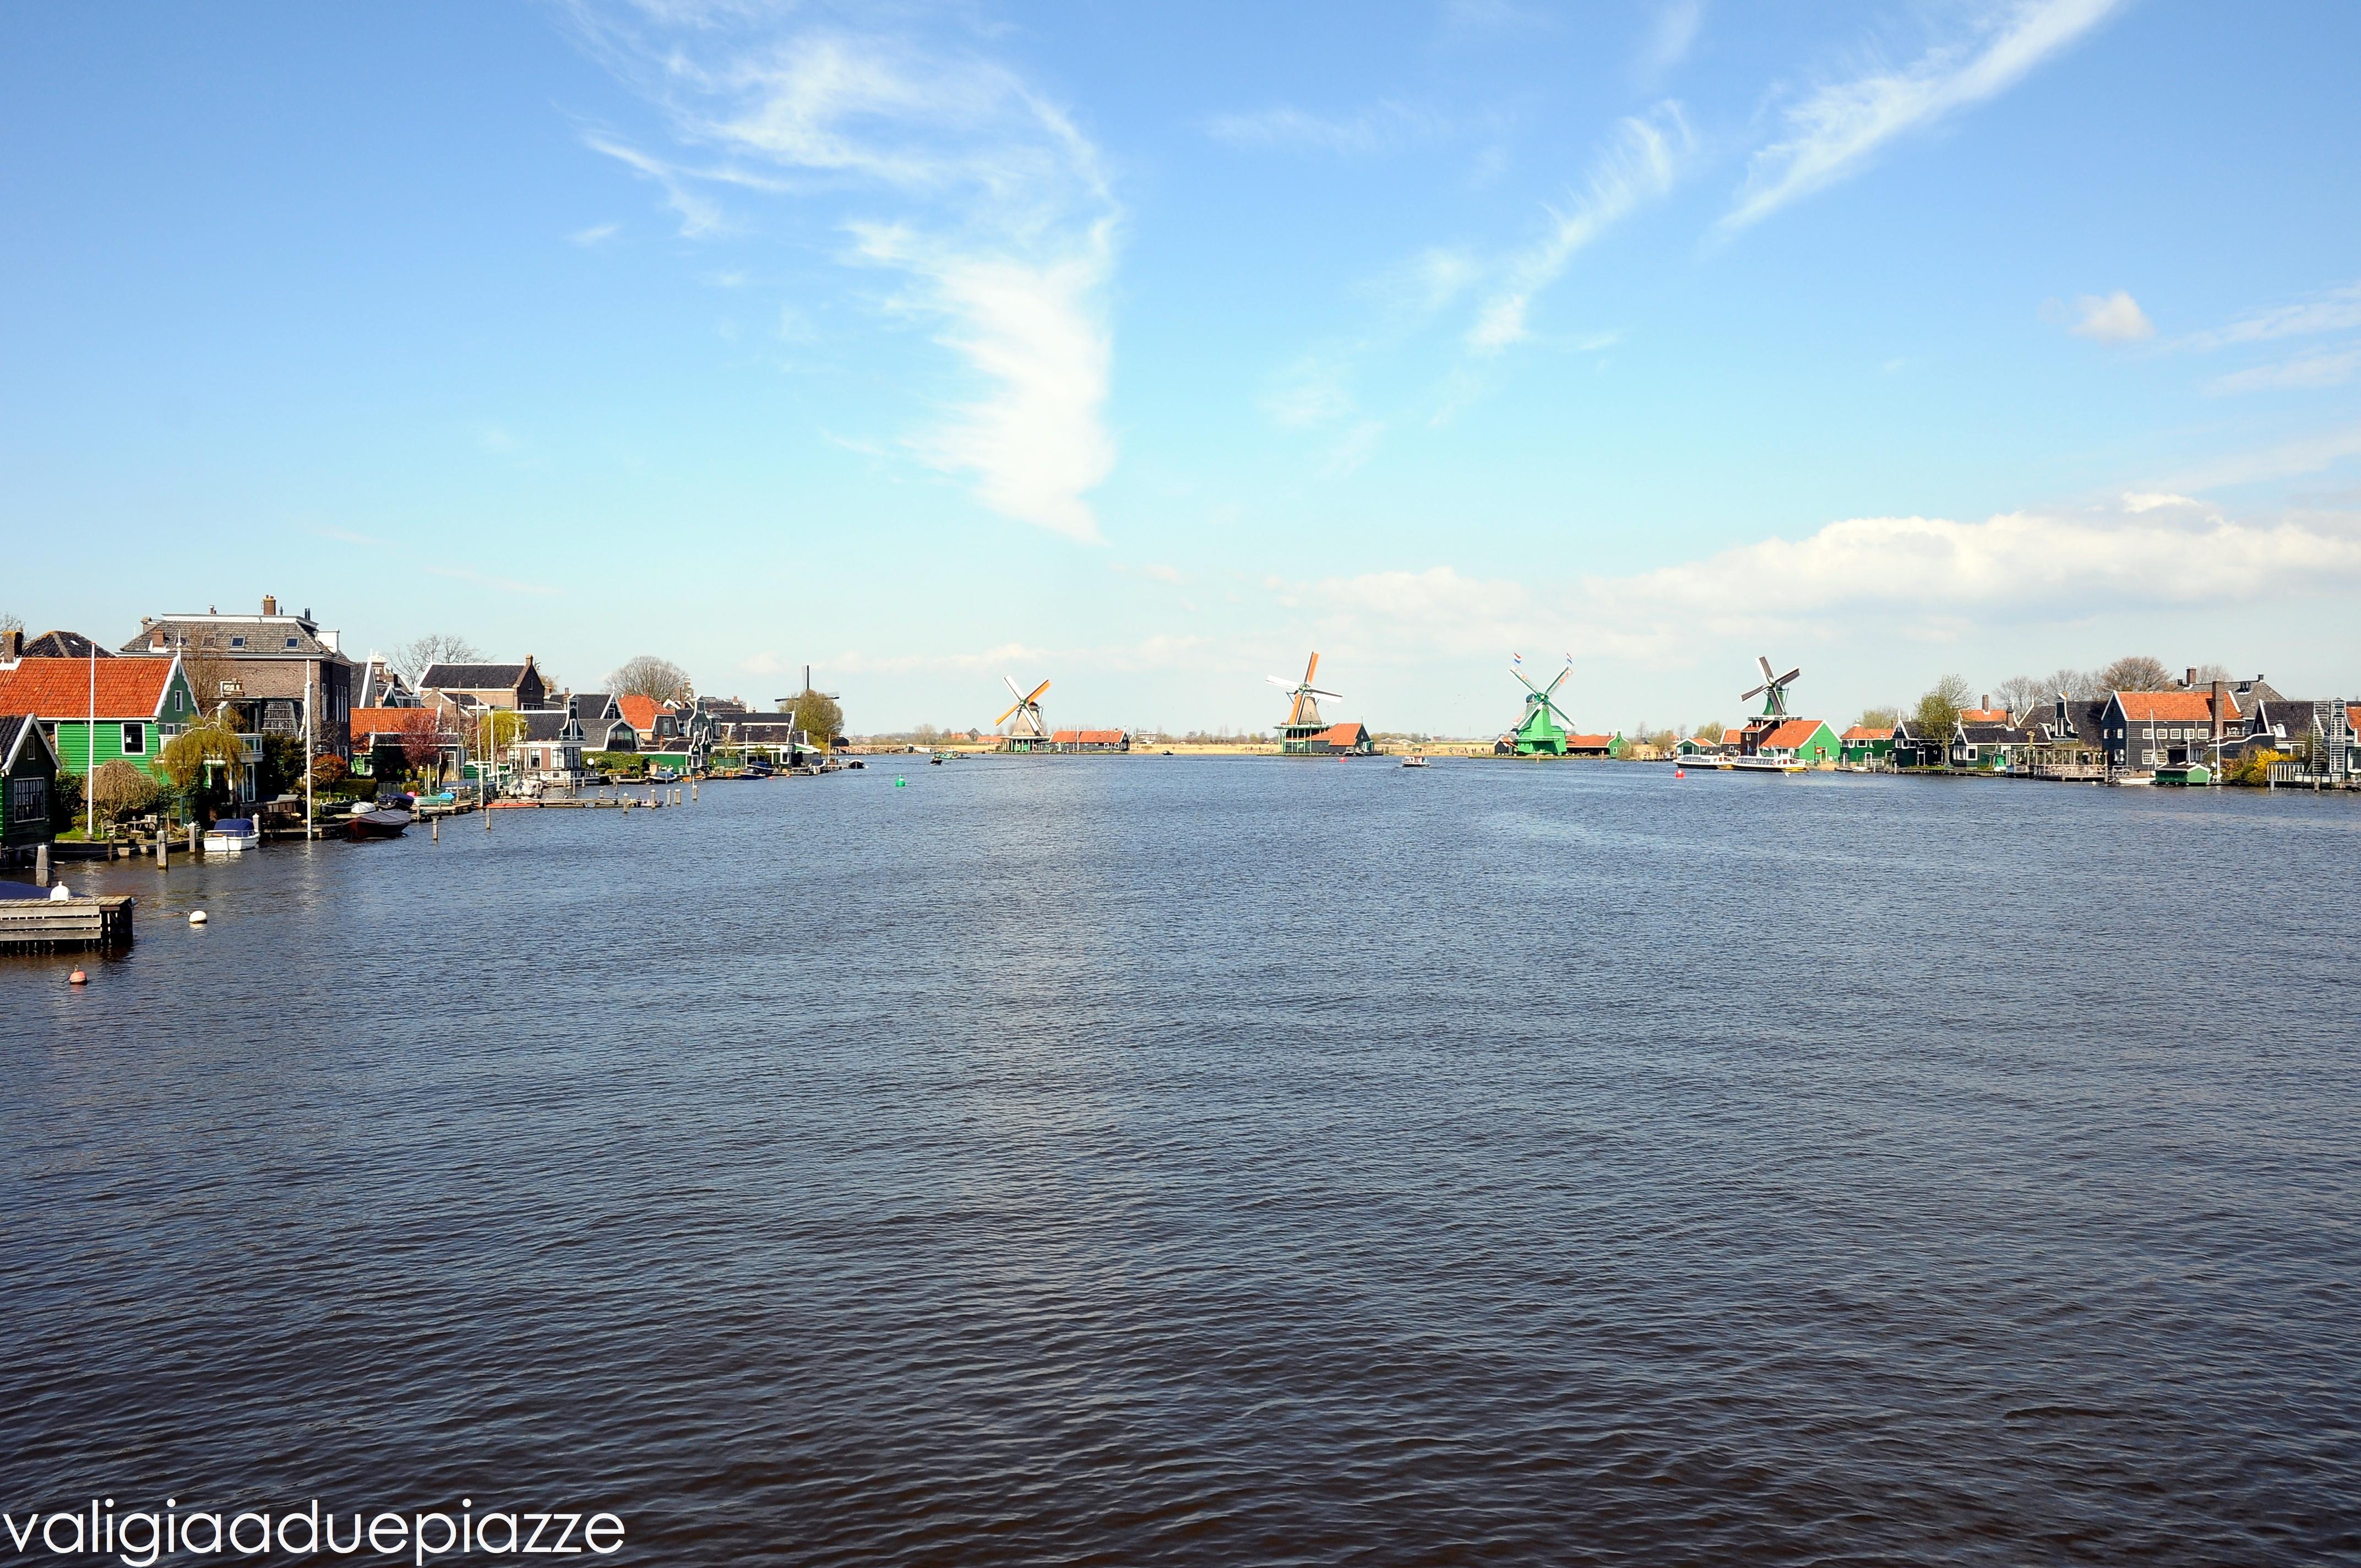 Vendita Case In Olanda olanda, i mulini a vento di zaanse schans